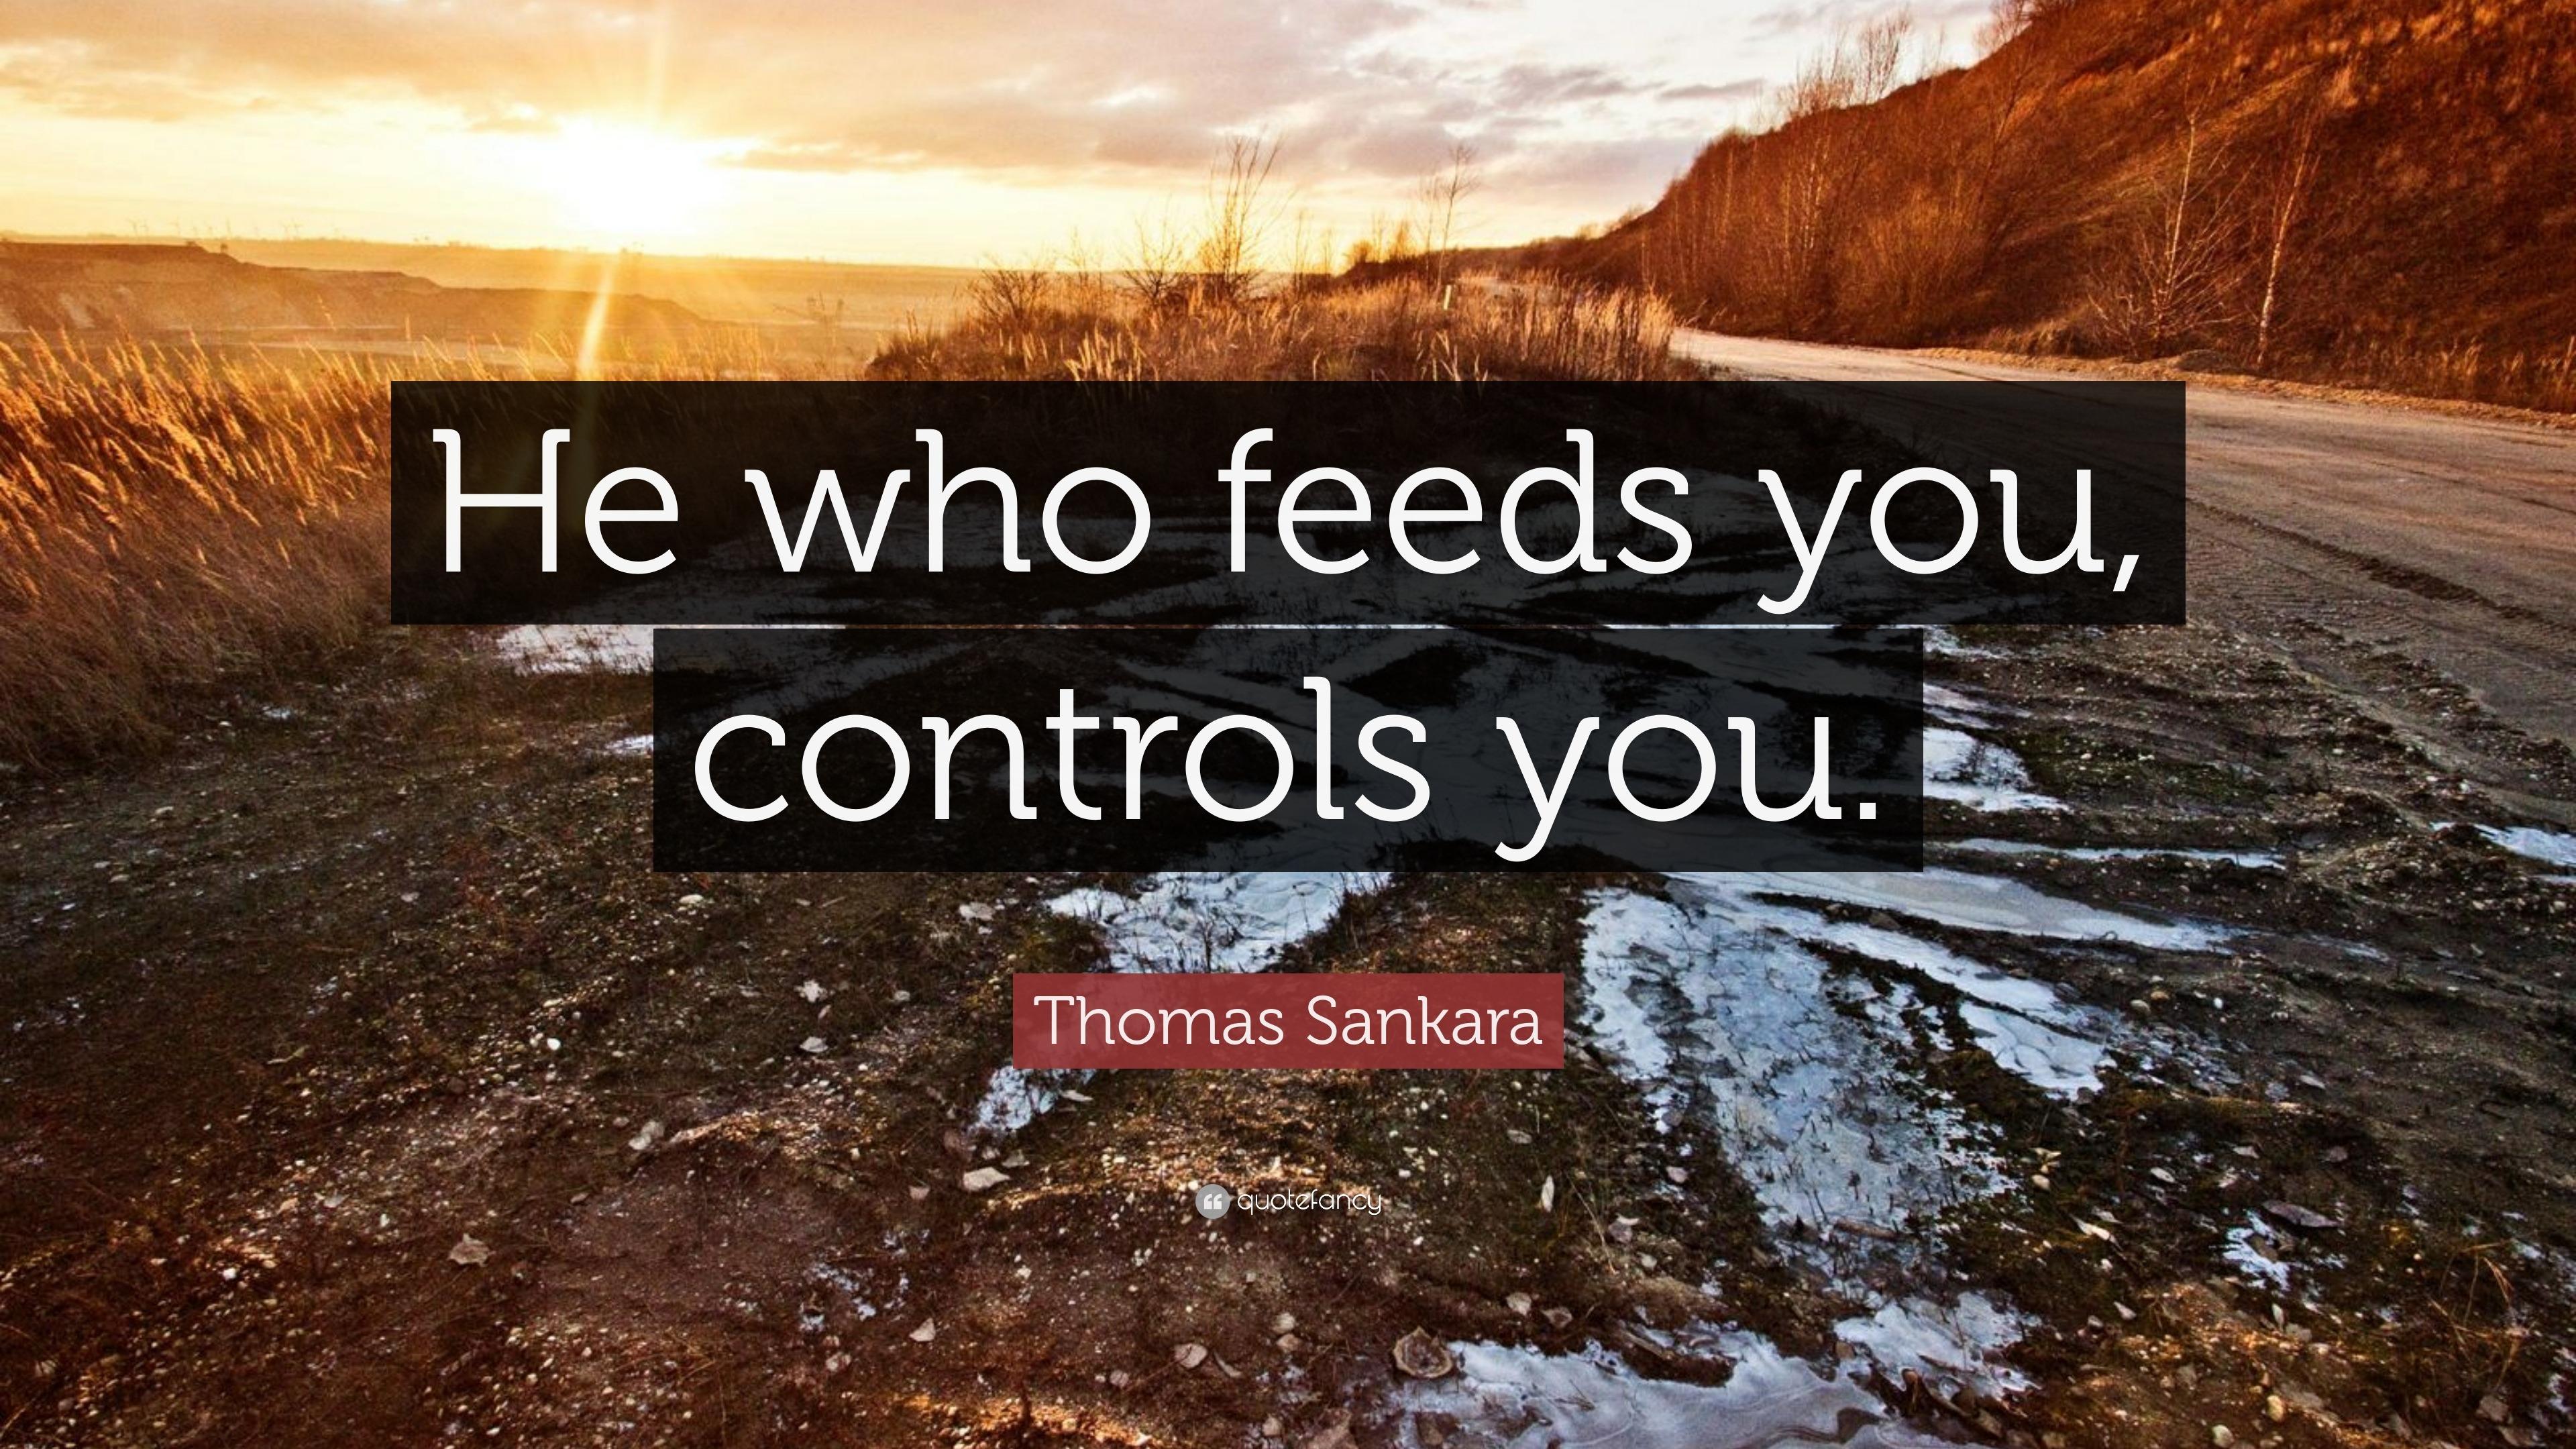 Thomas Sankara Quotes (28 wallpapers)   Quotefancy